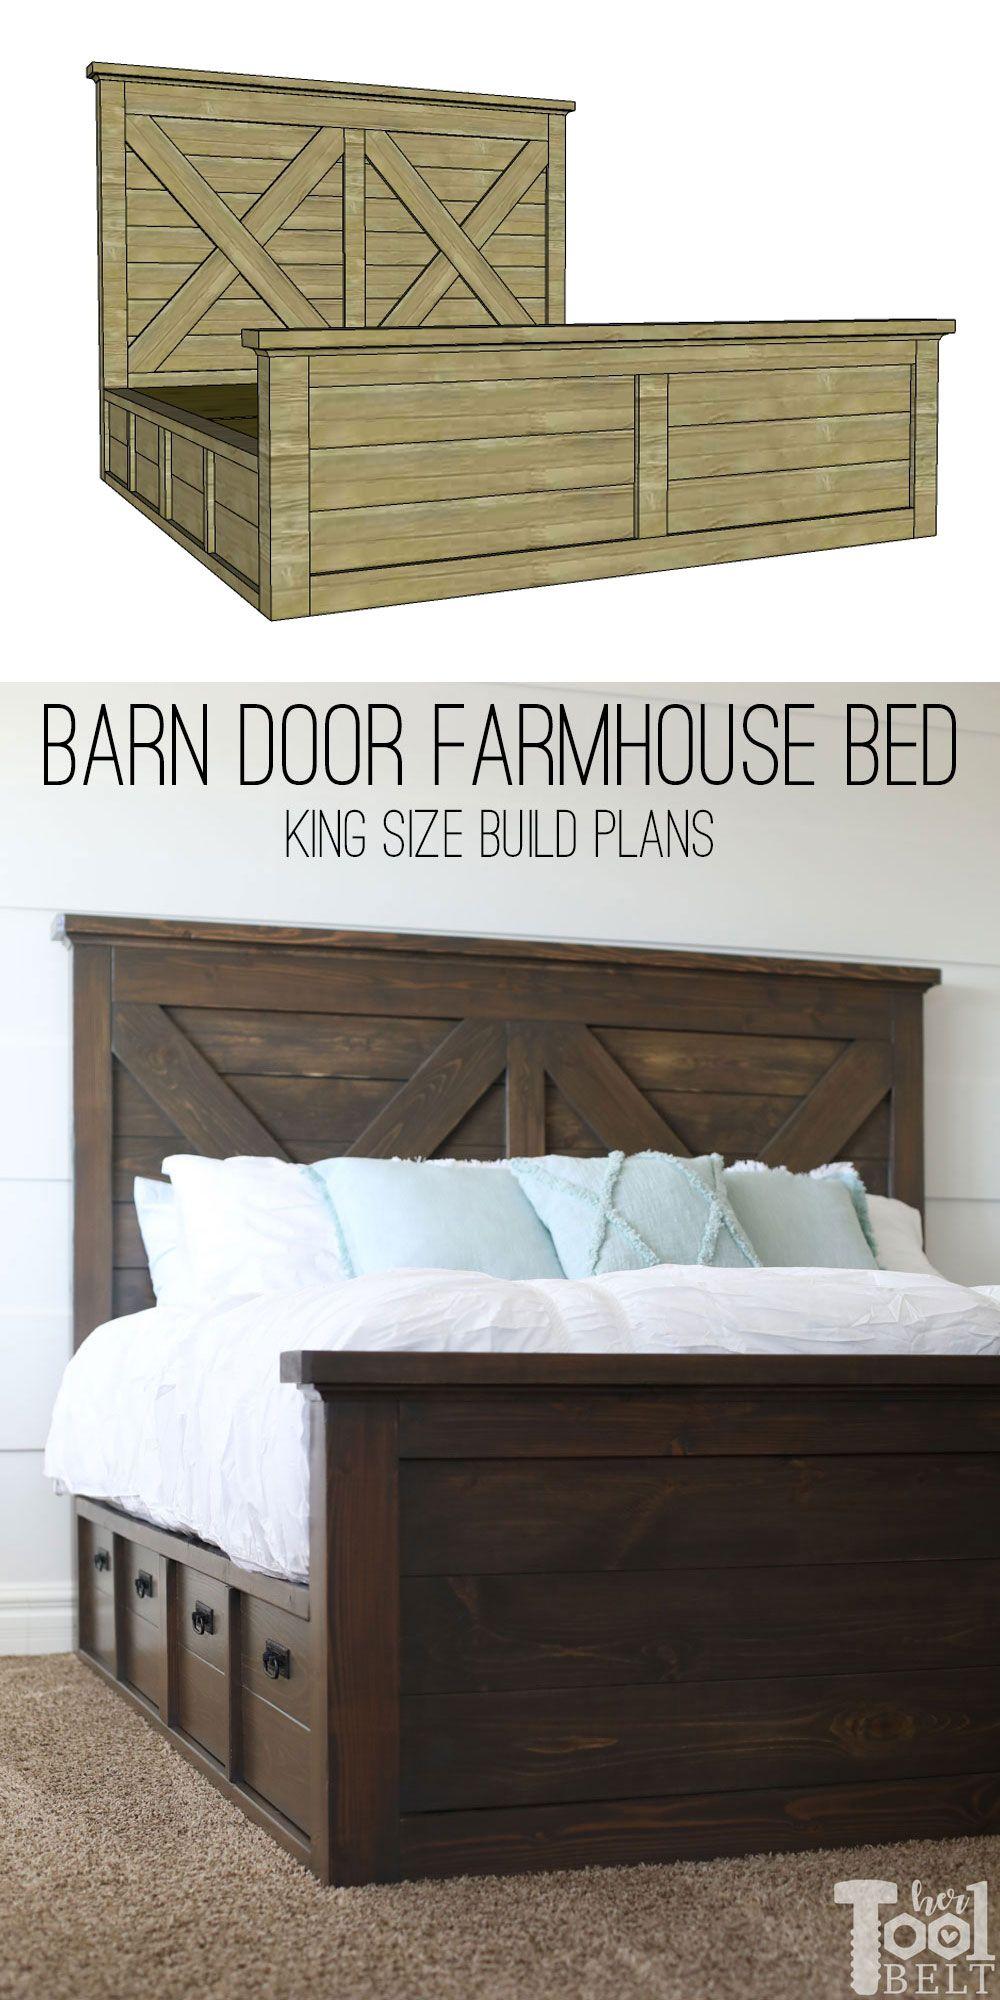 King X Barn Door Farmhouse Bed Plans Diy king bed frame